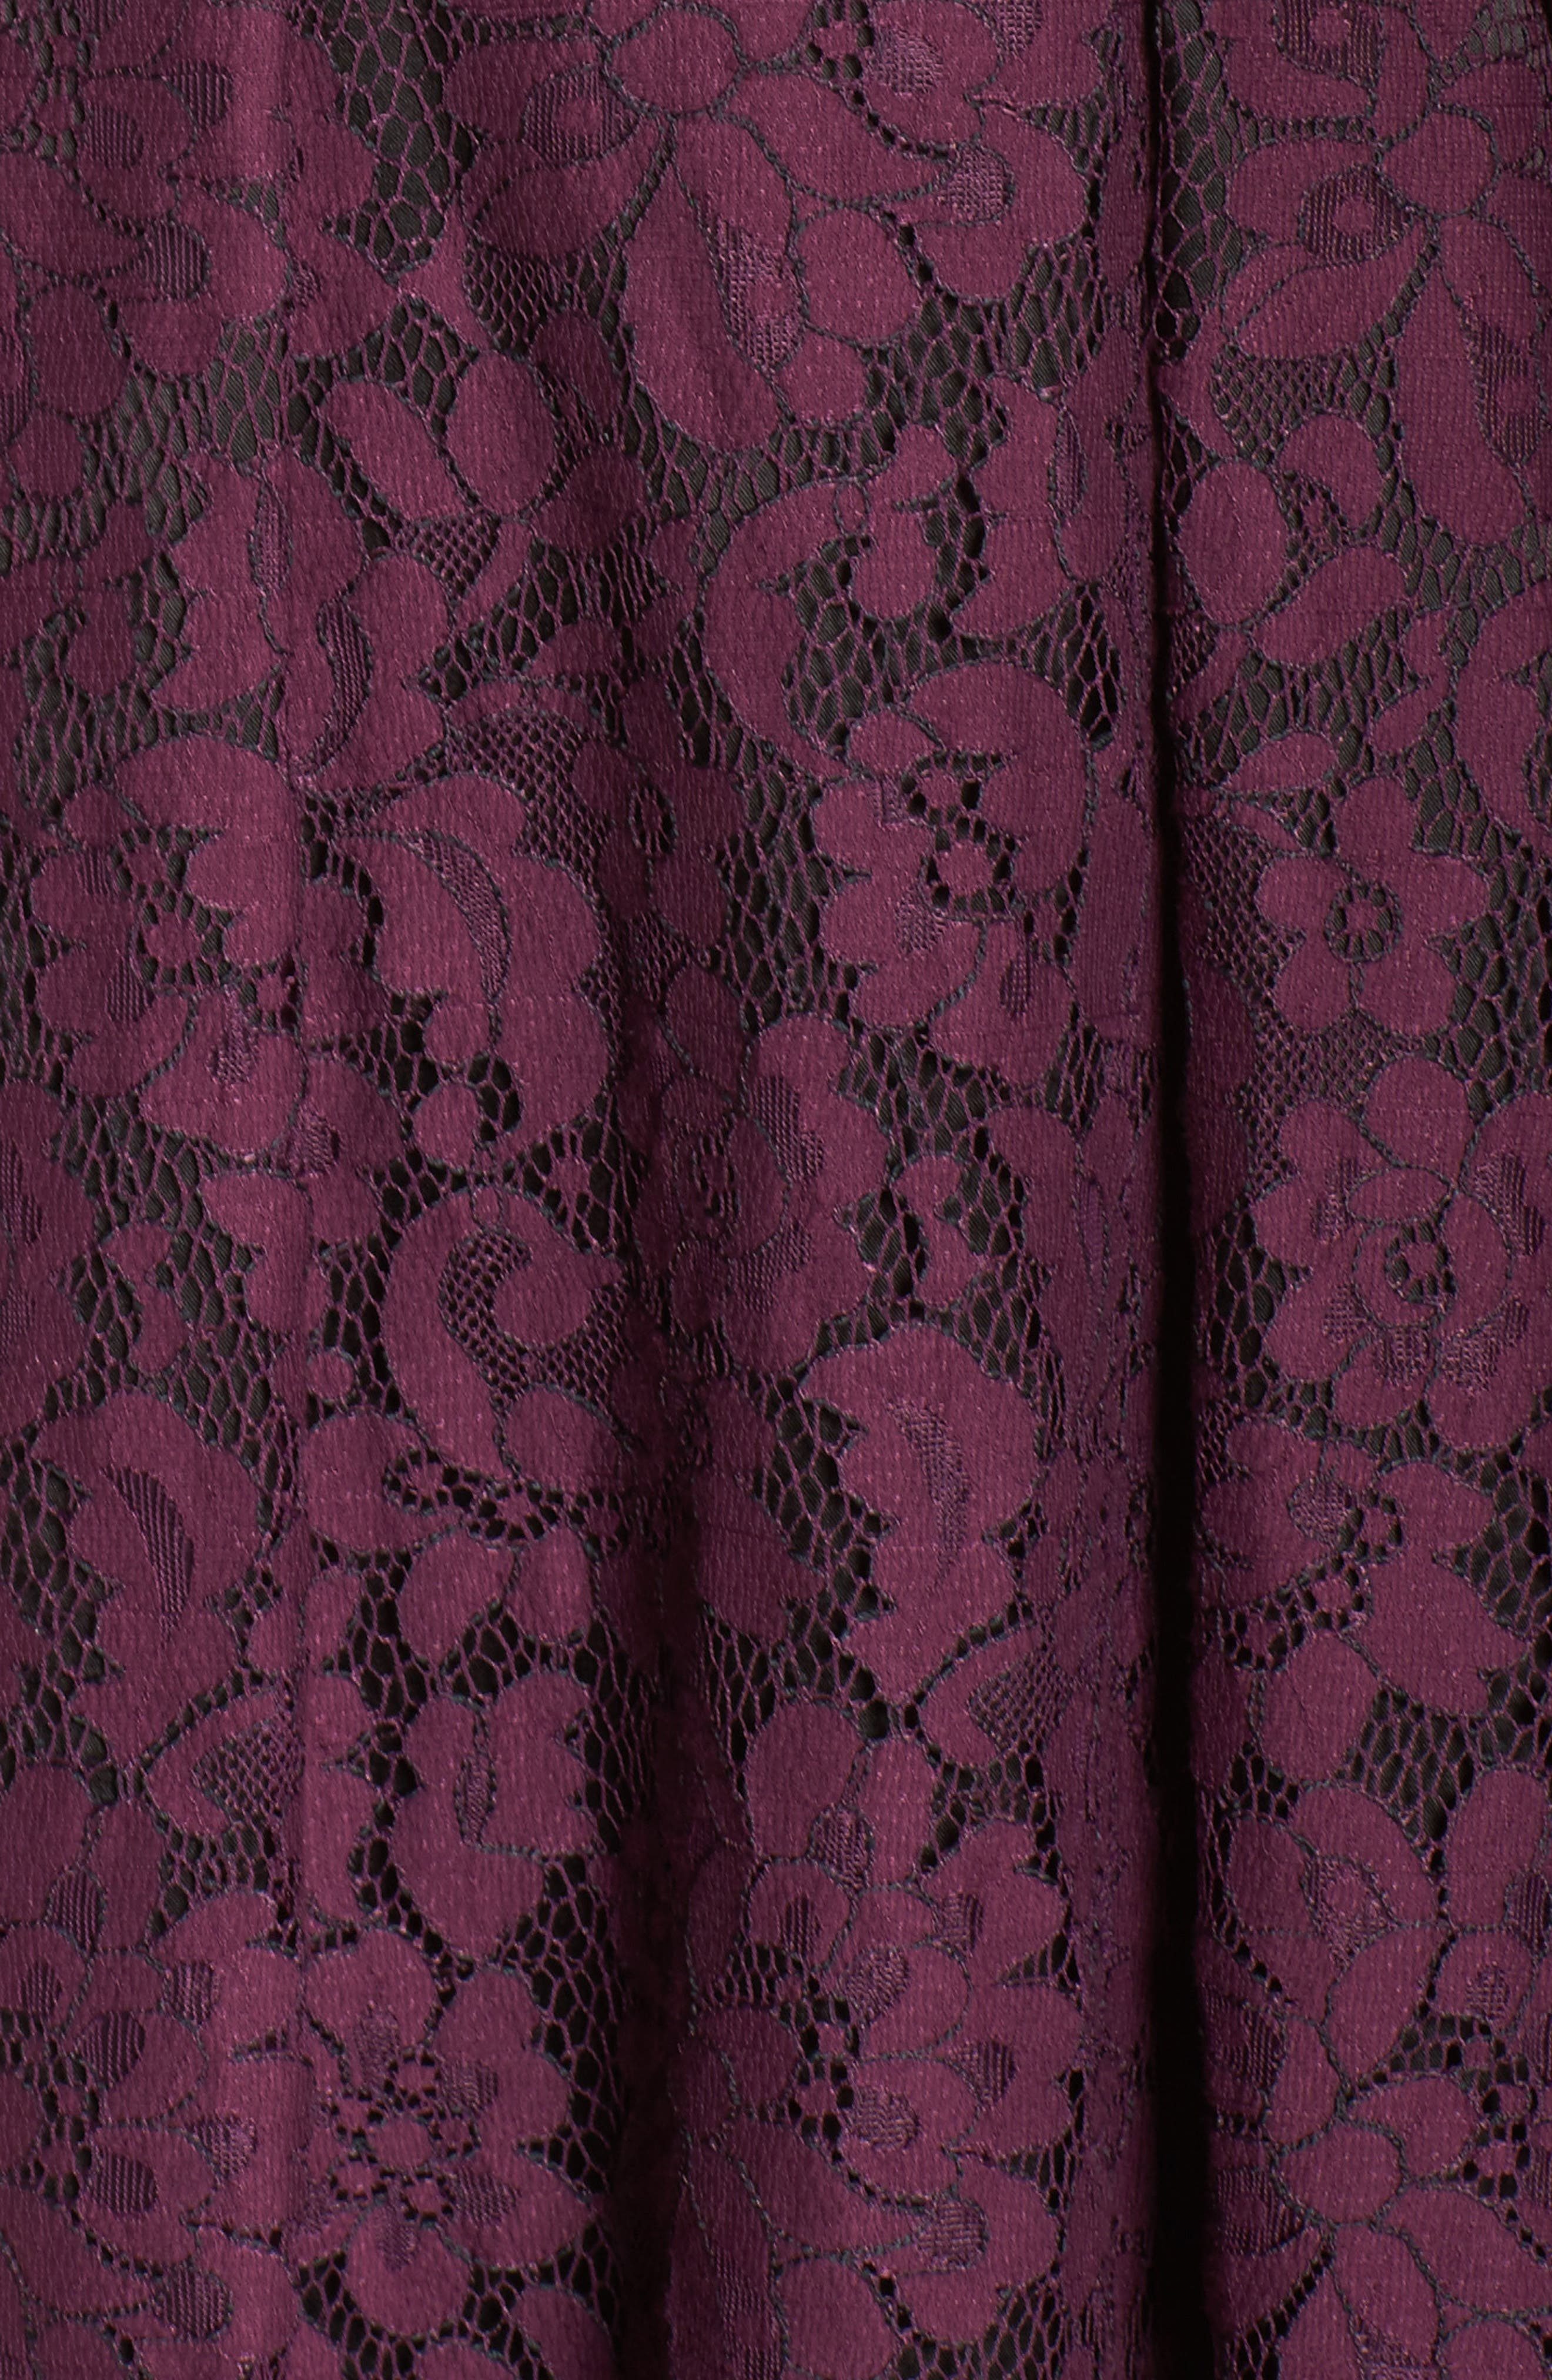 Lace Fit & Flare Dress,                             Alternate thumbnail 5, color,                             Raisin